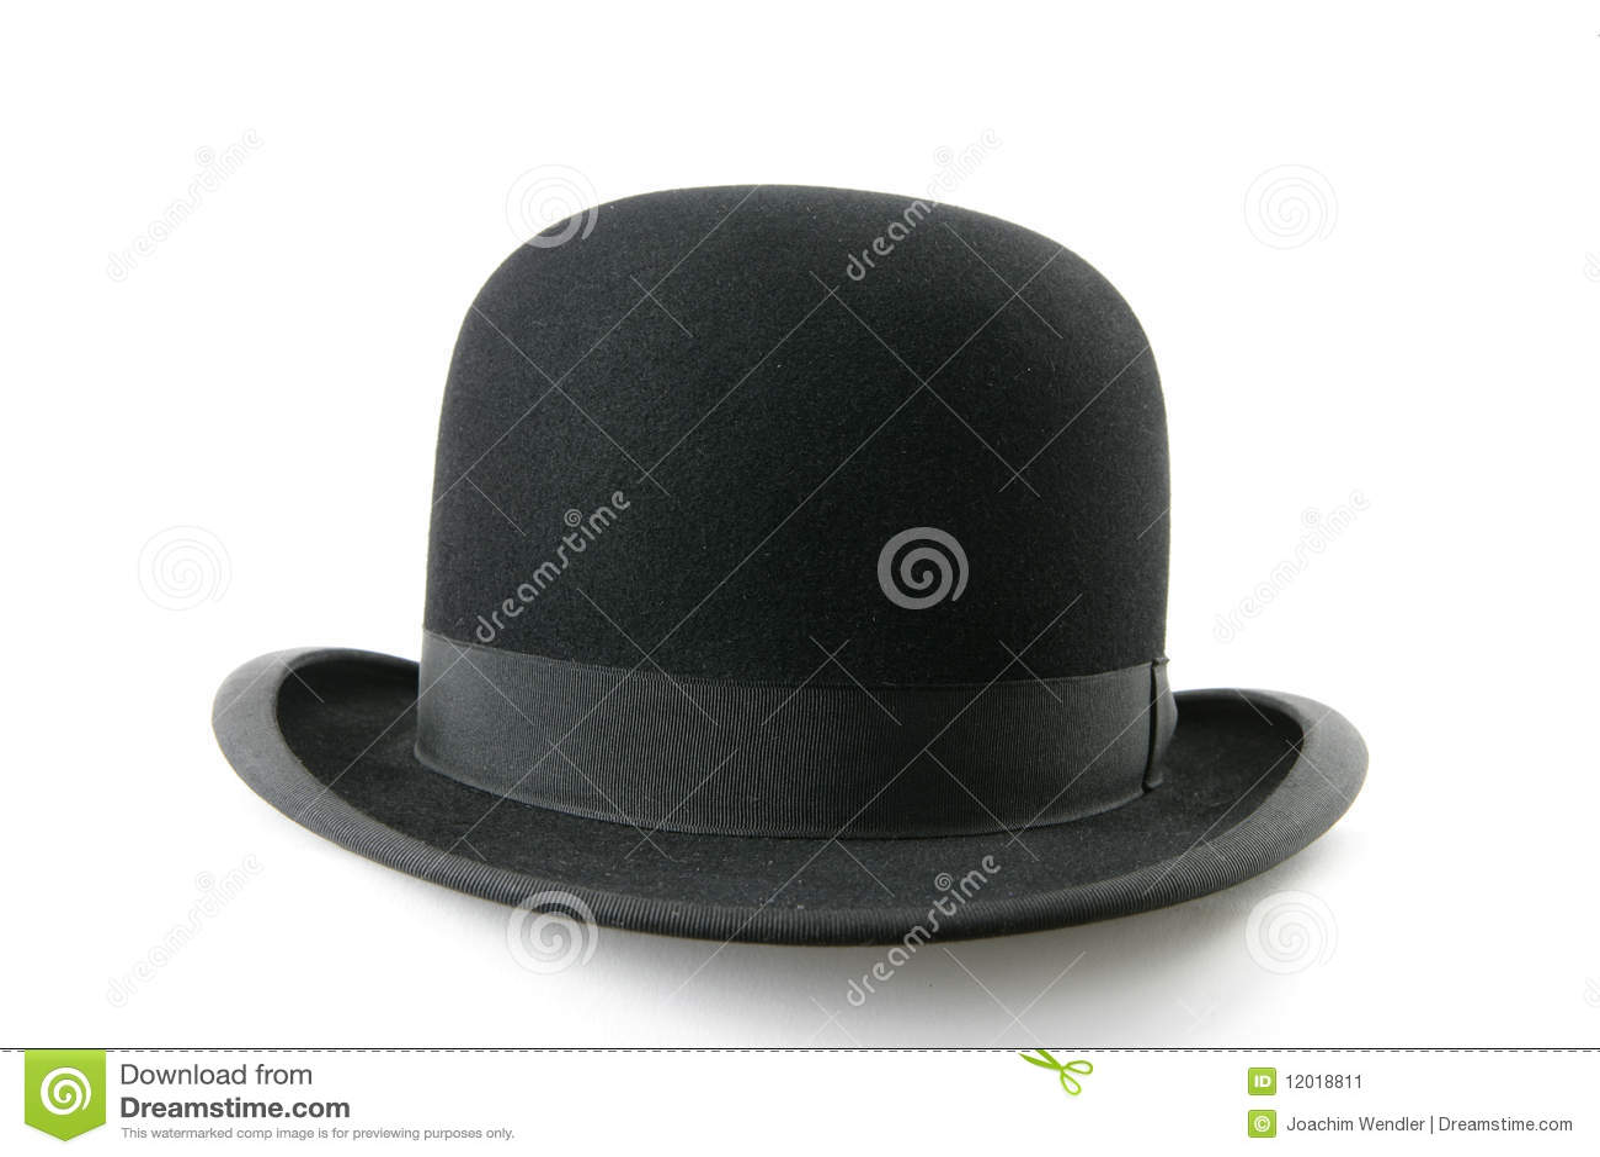 Dęciaka czarny kapelusz